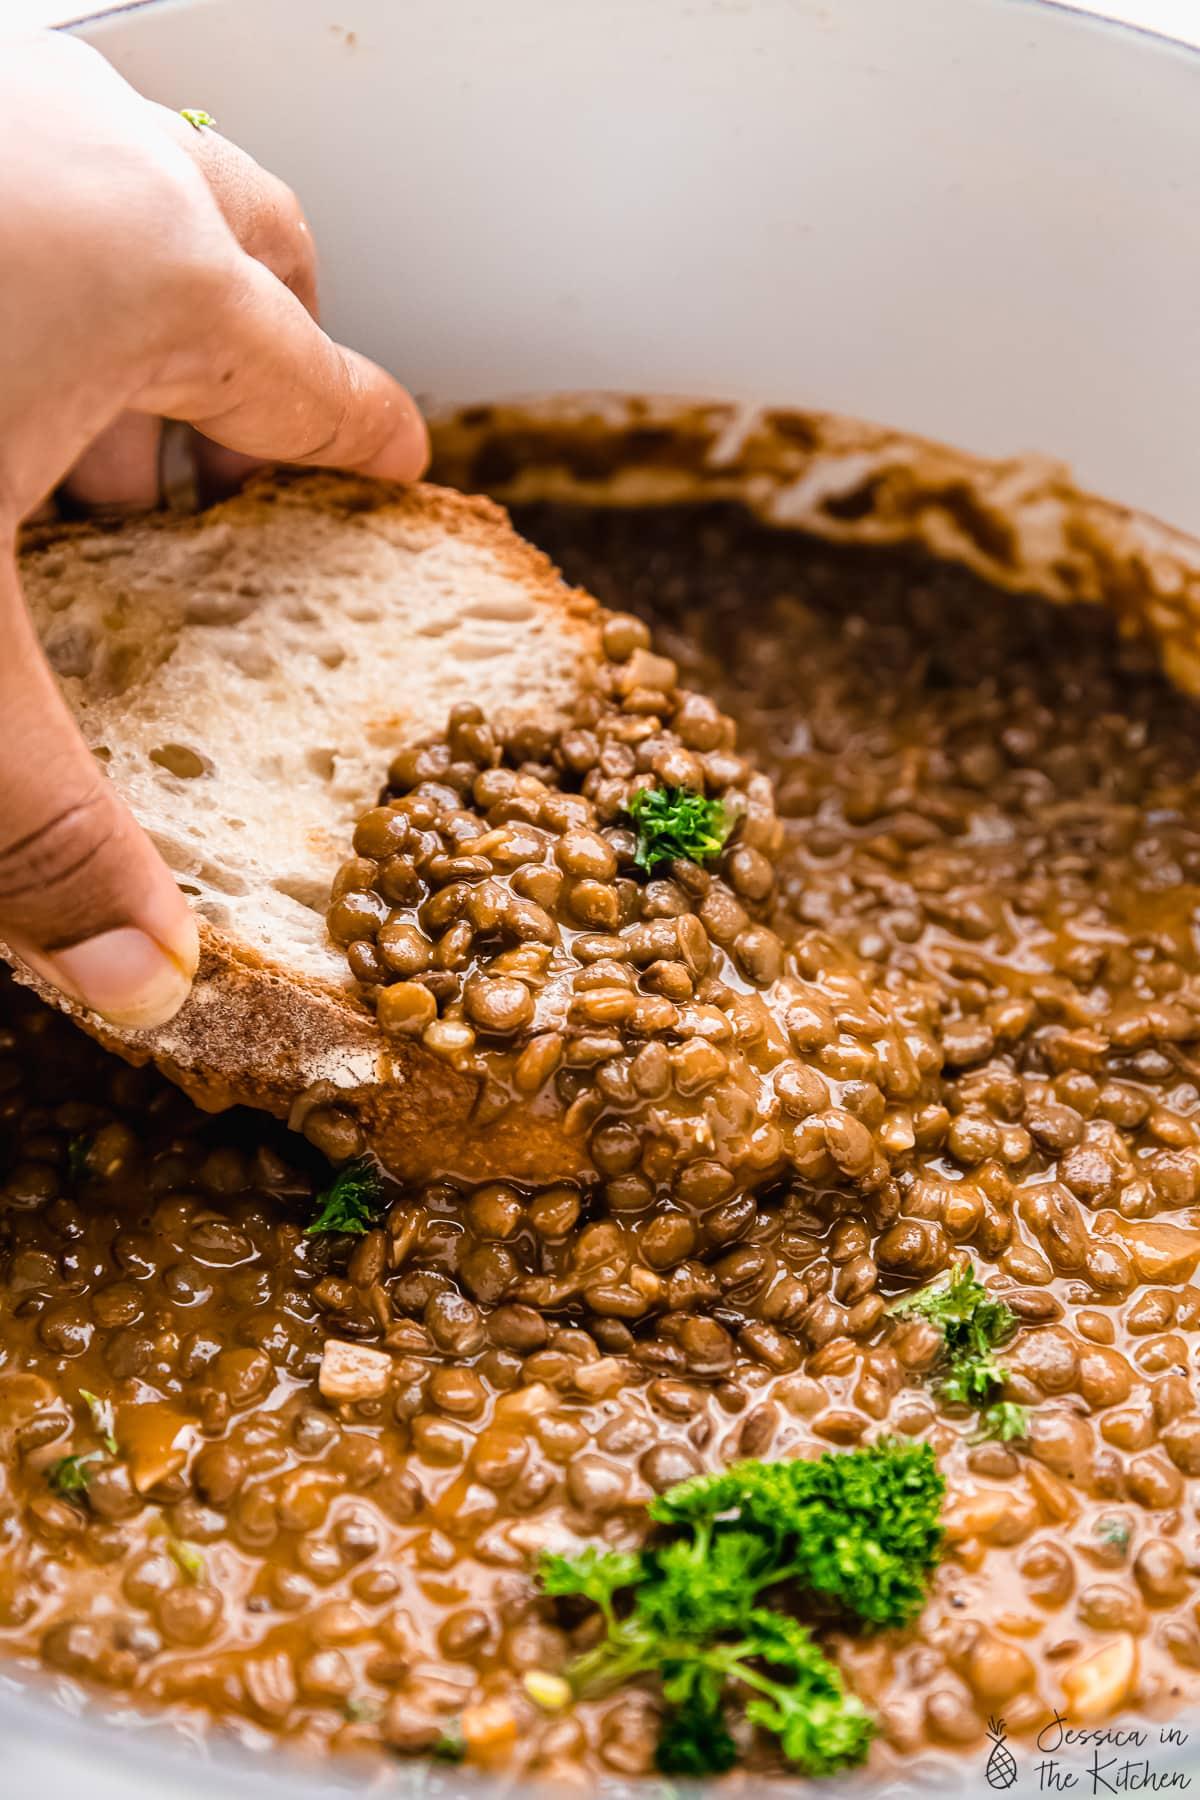 Hand dipping bread into vegan lentil stew.